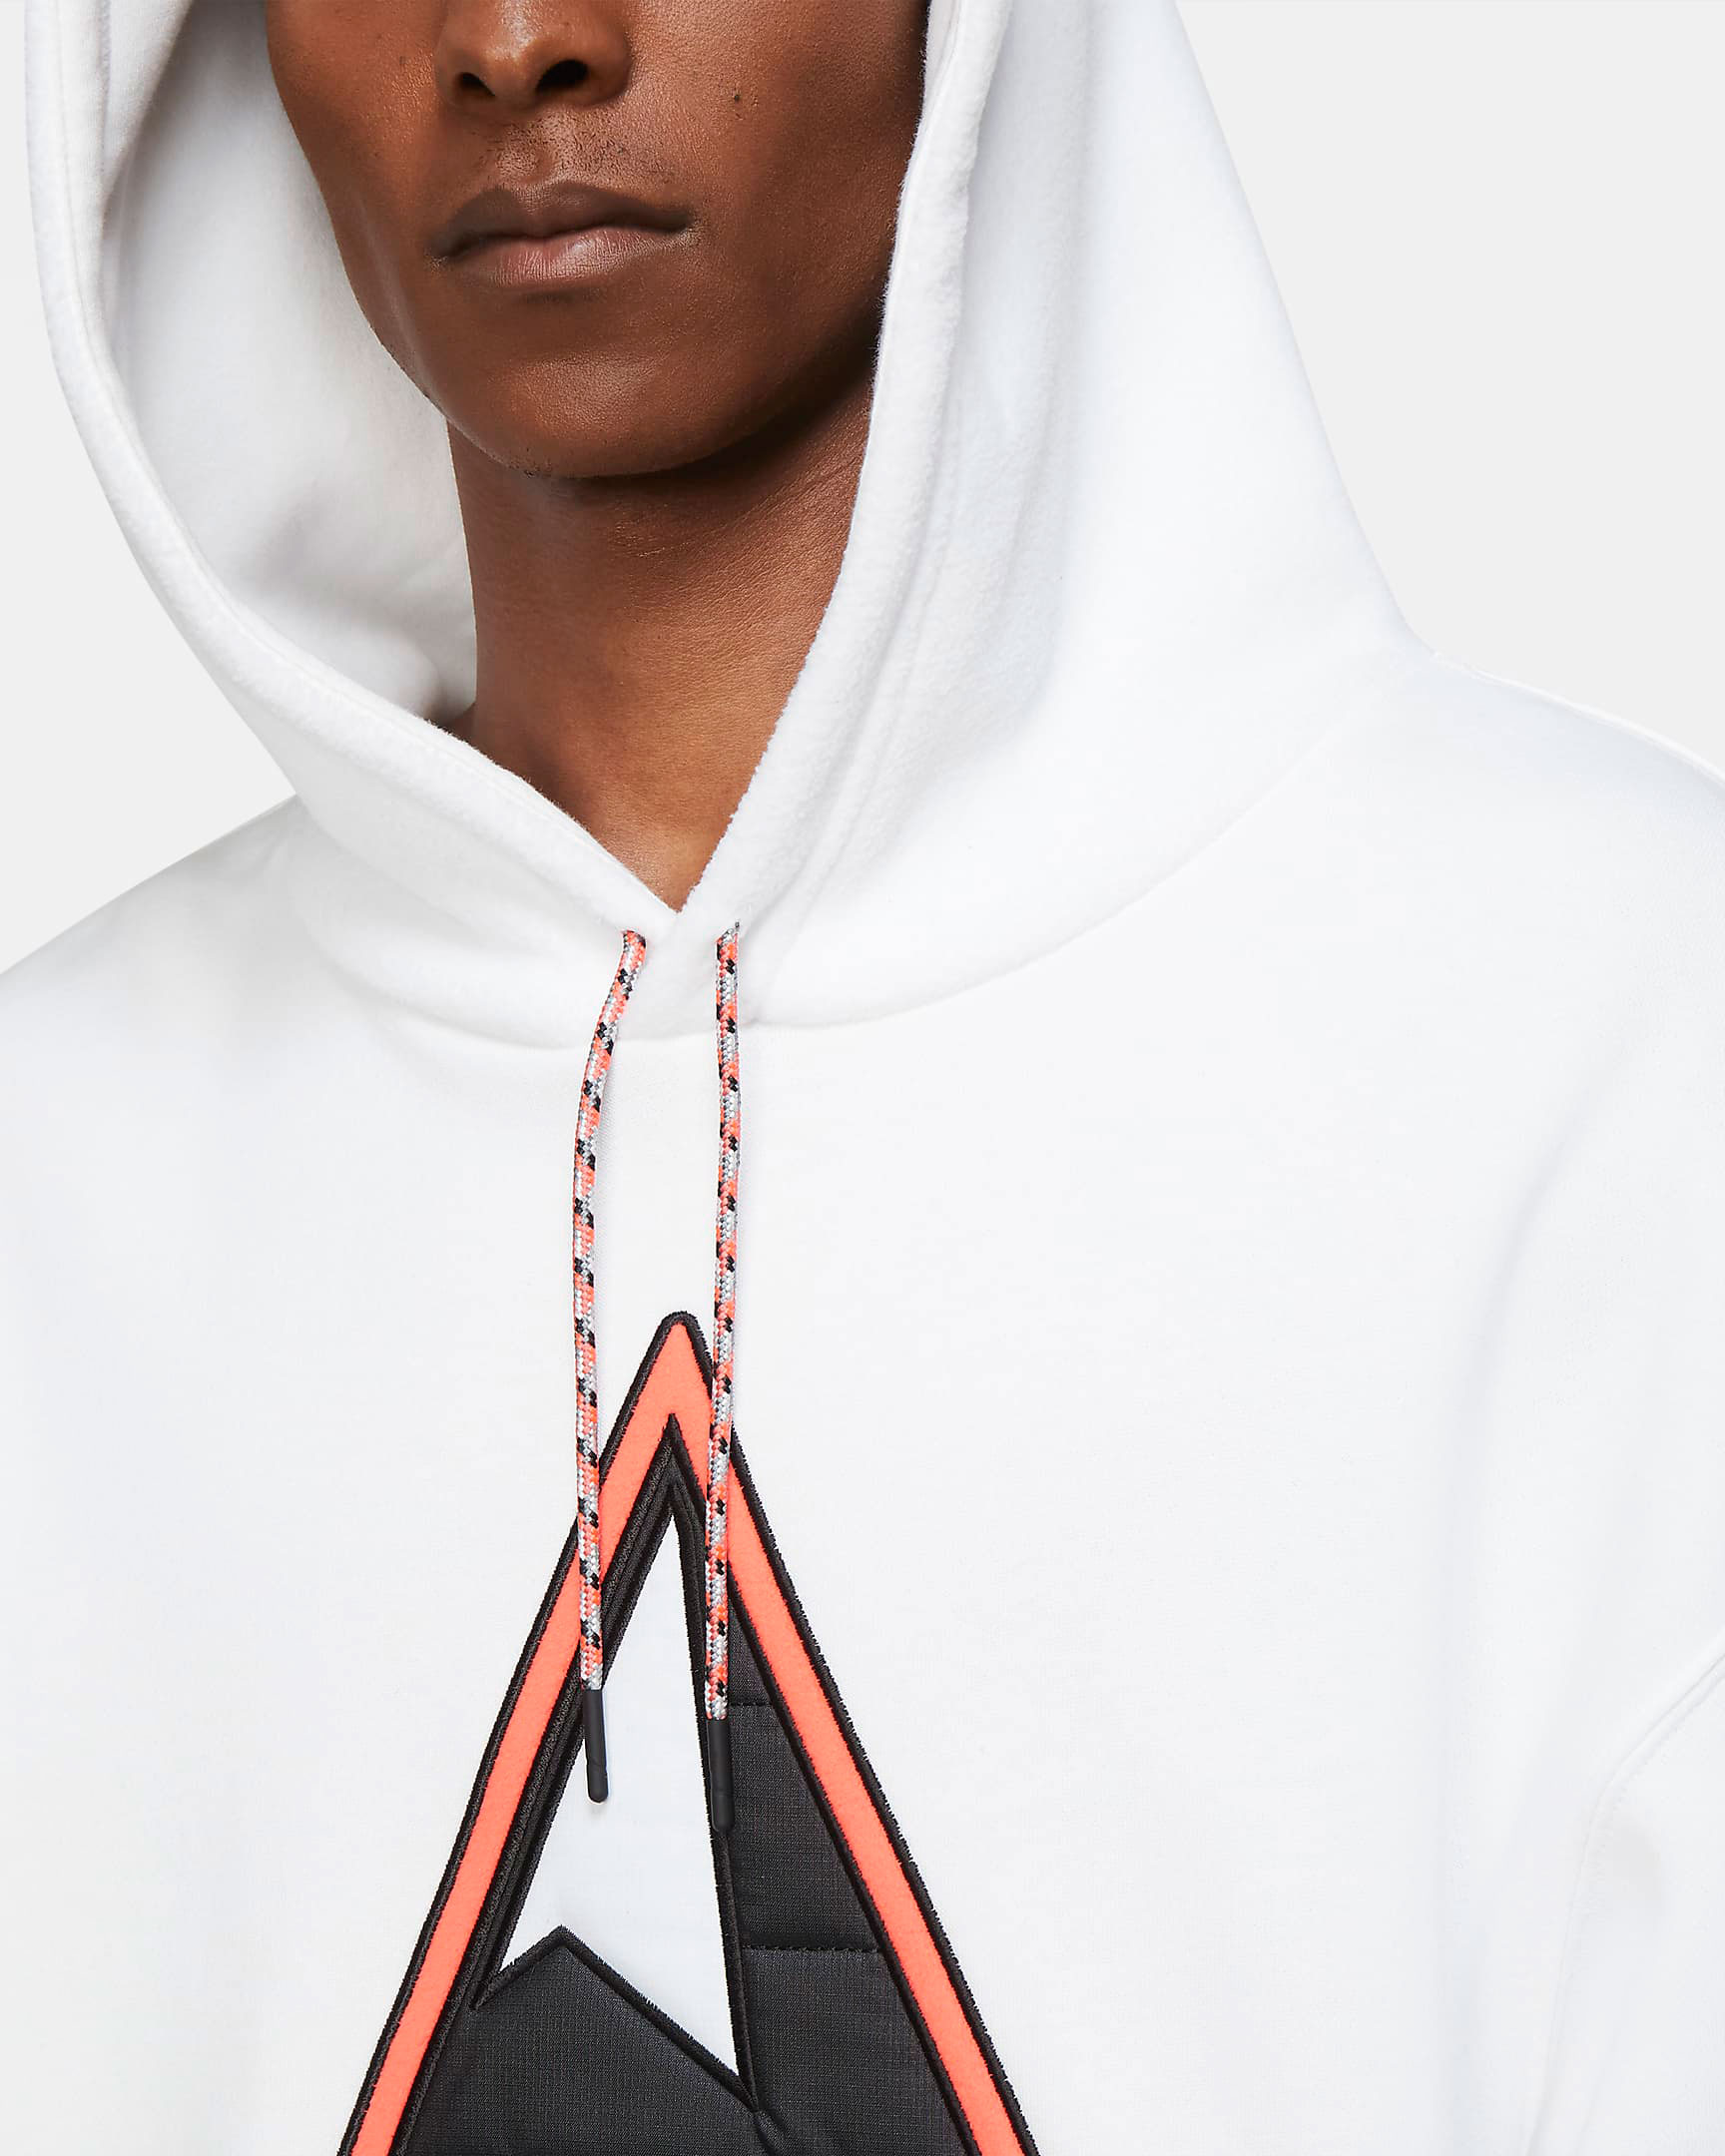 air-jordan-11-adapt-hoodie-match-3